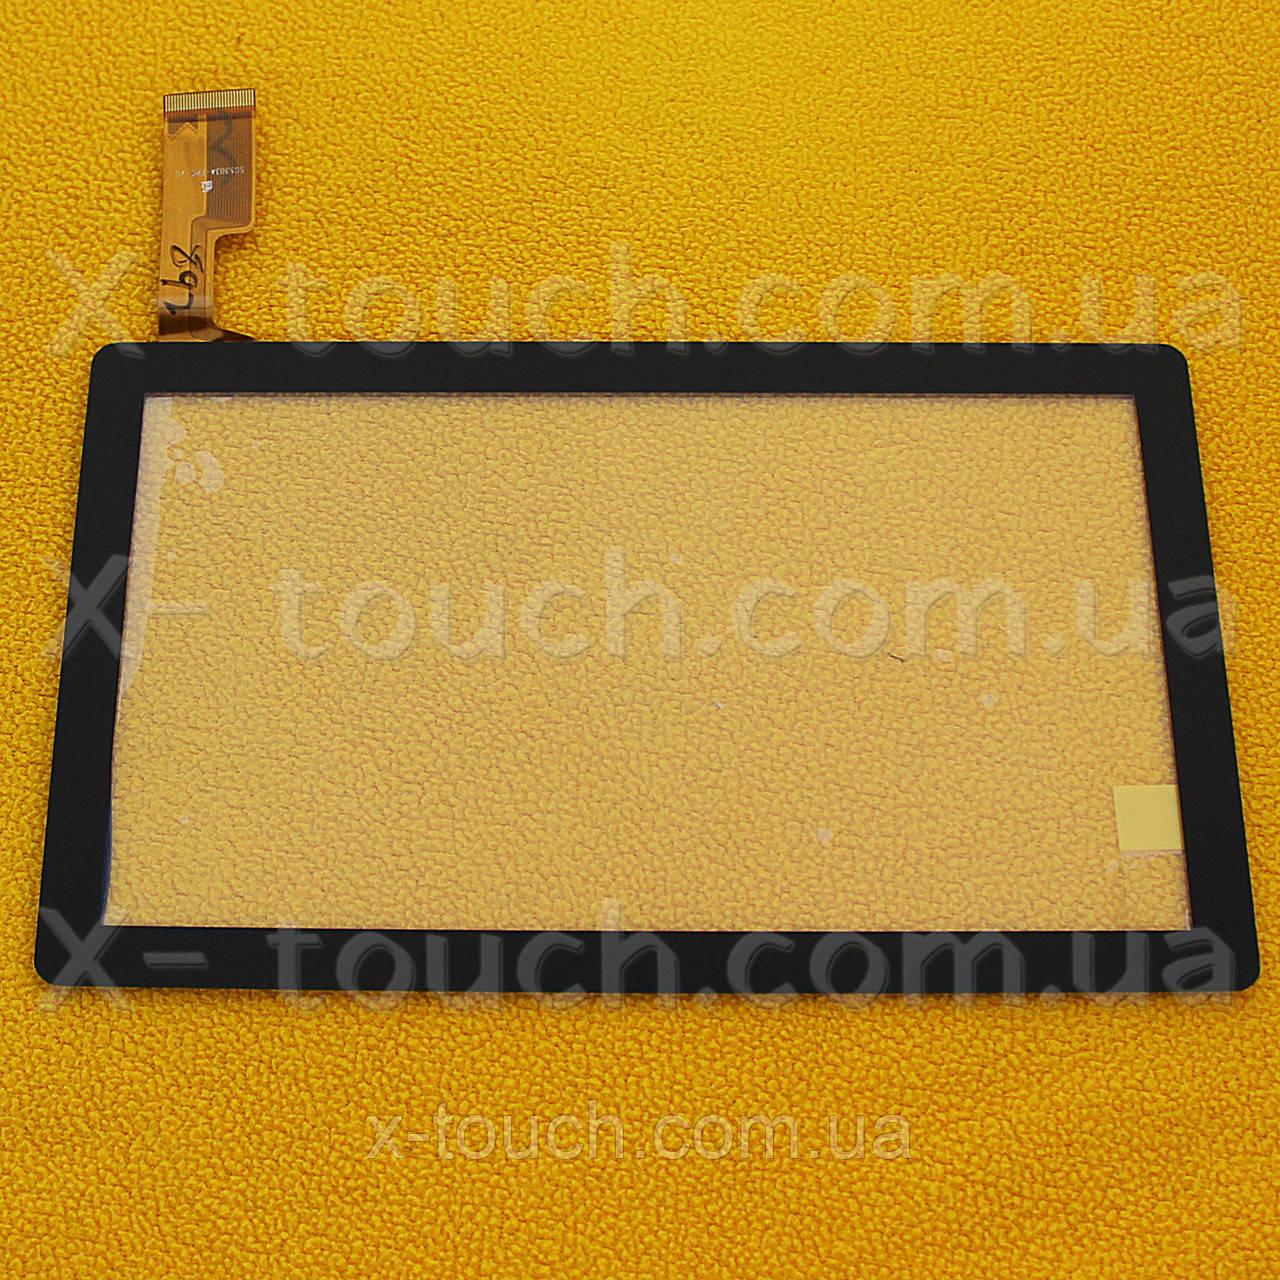 Тачскрин, сенсор  sg5303a-fpc-v0 для планшета